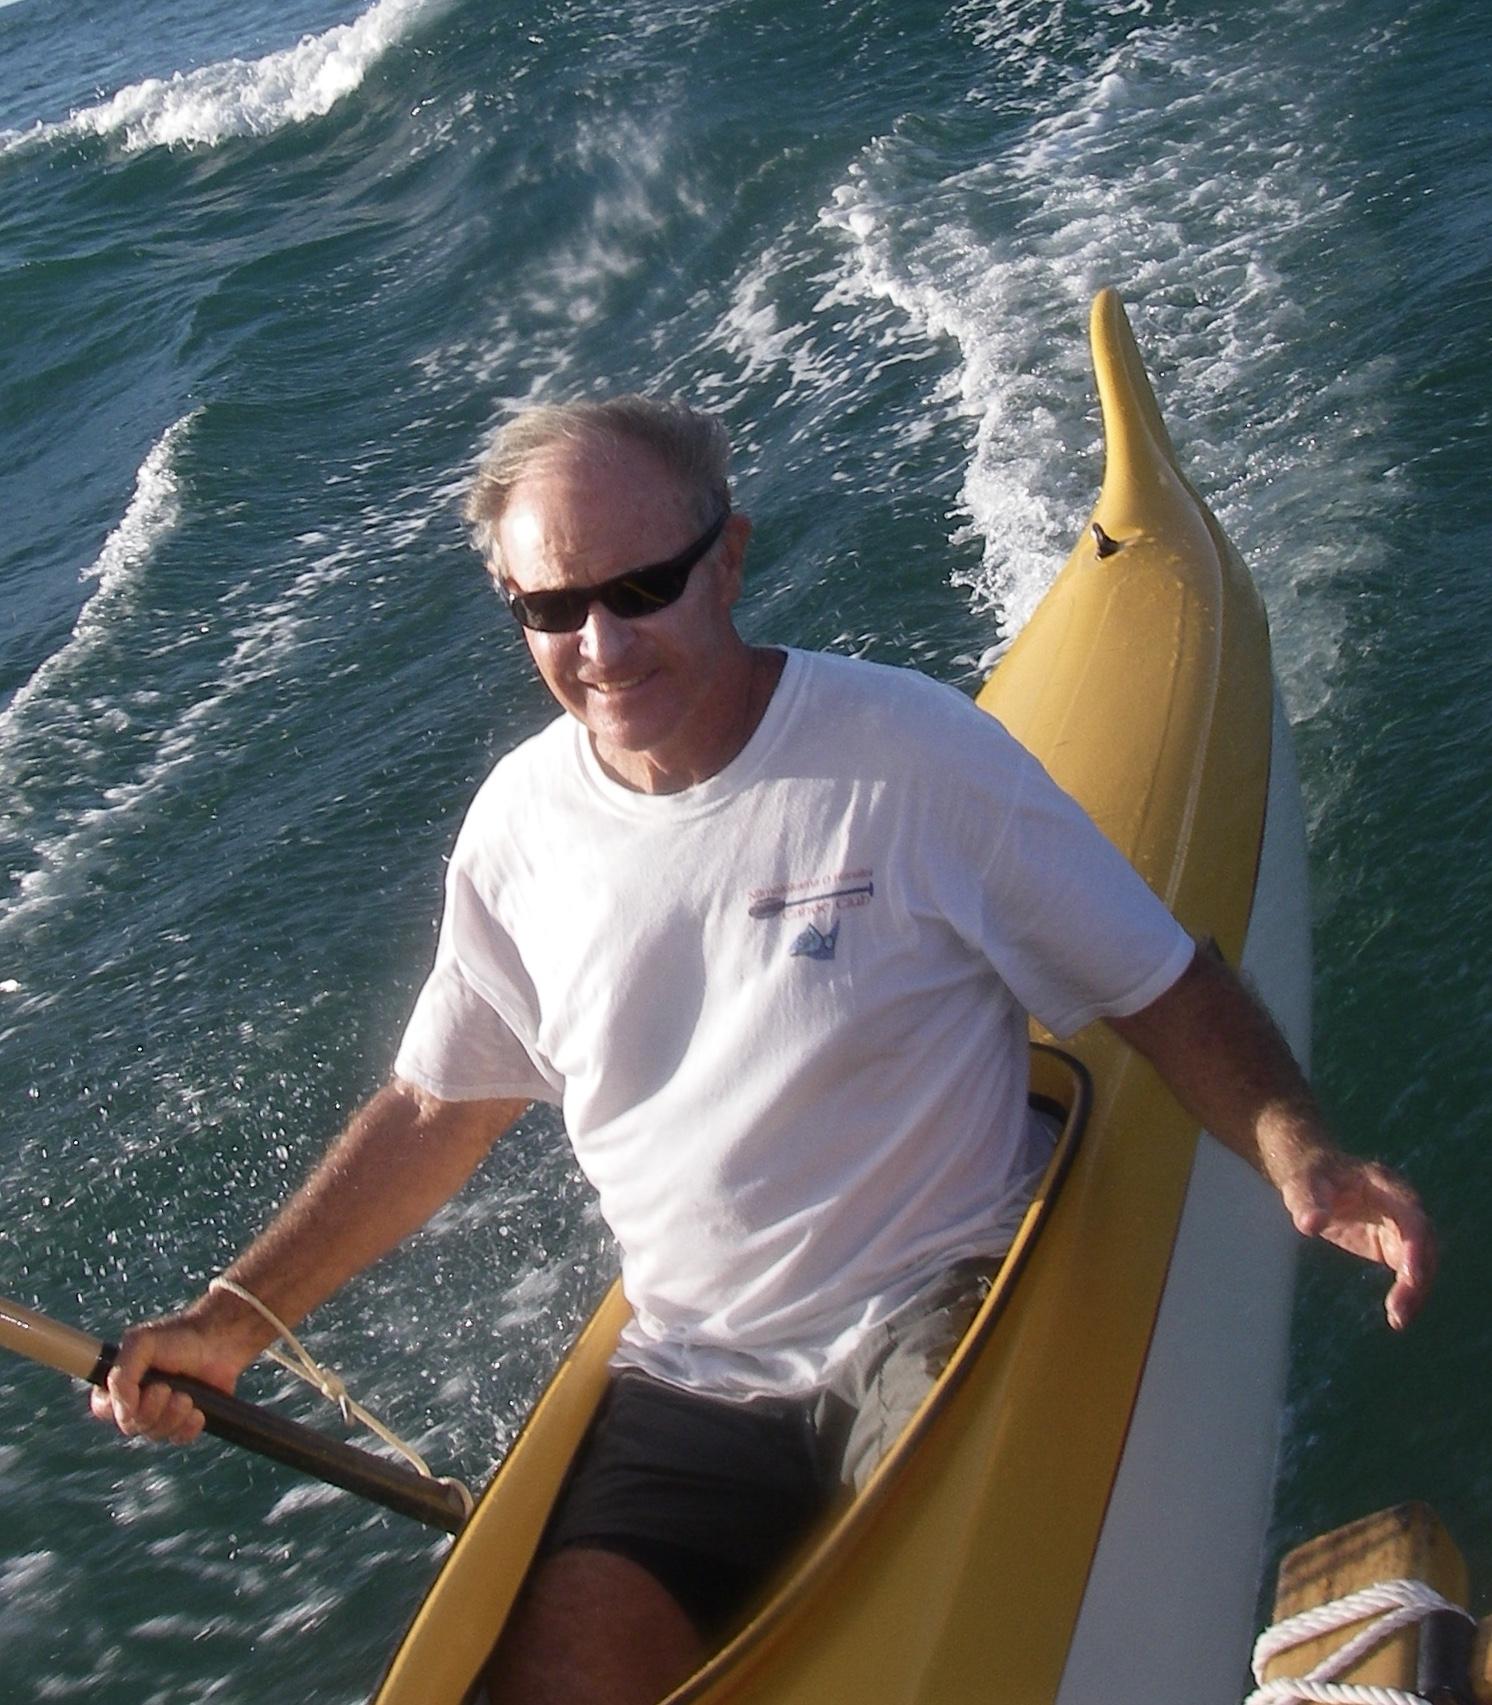 Nick Beck sail surfing